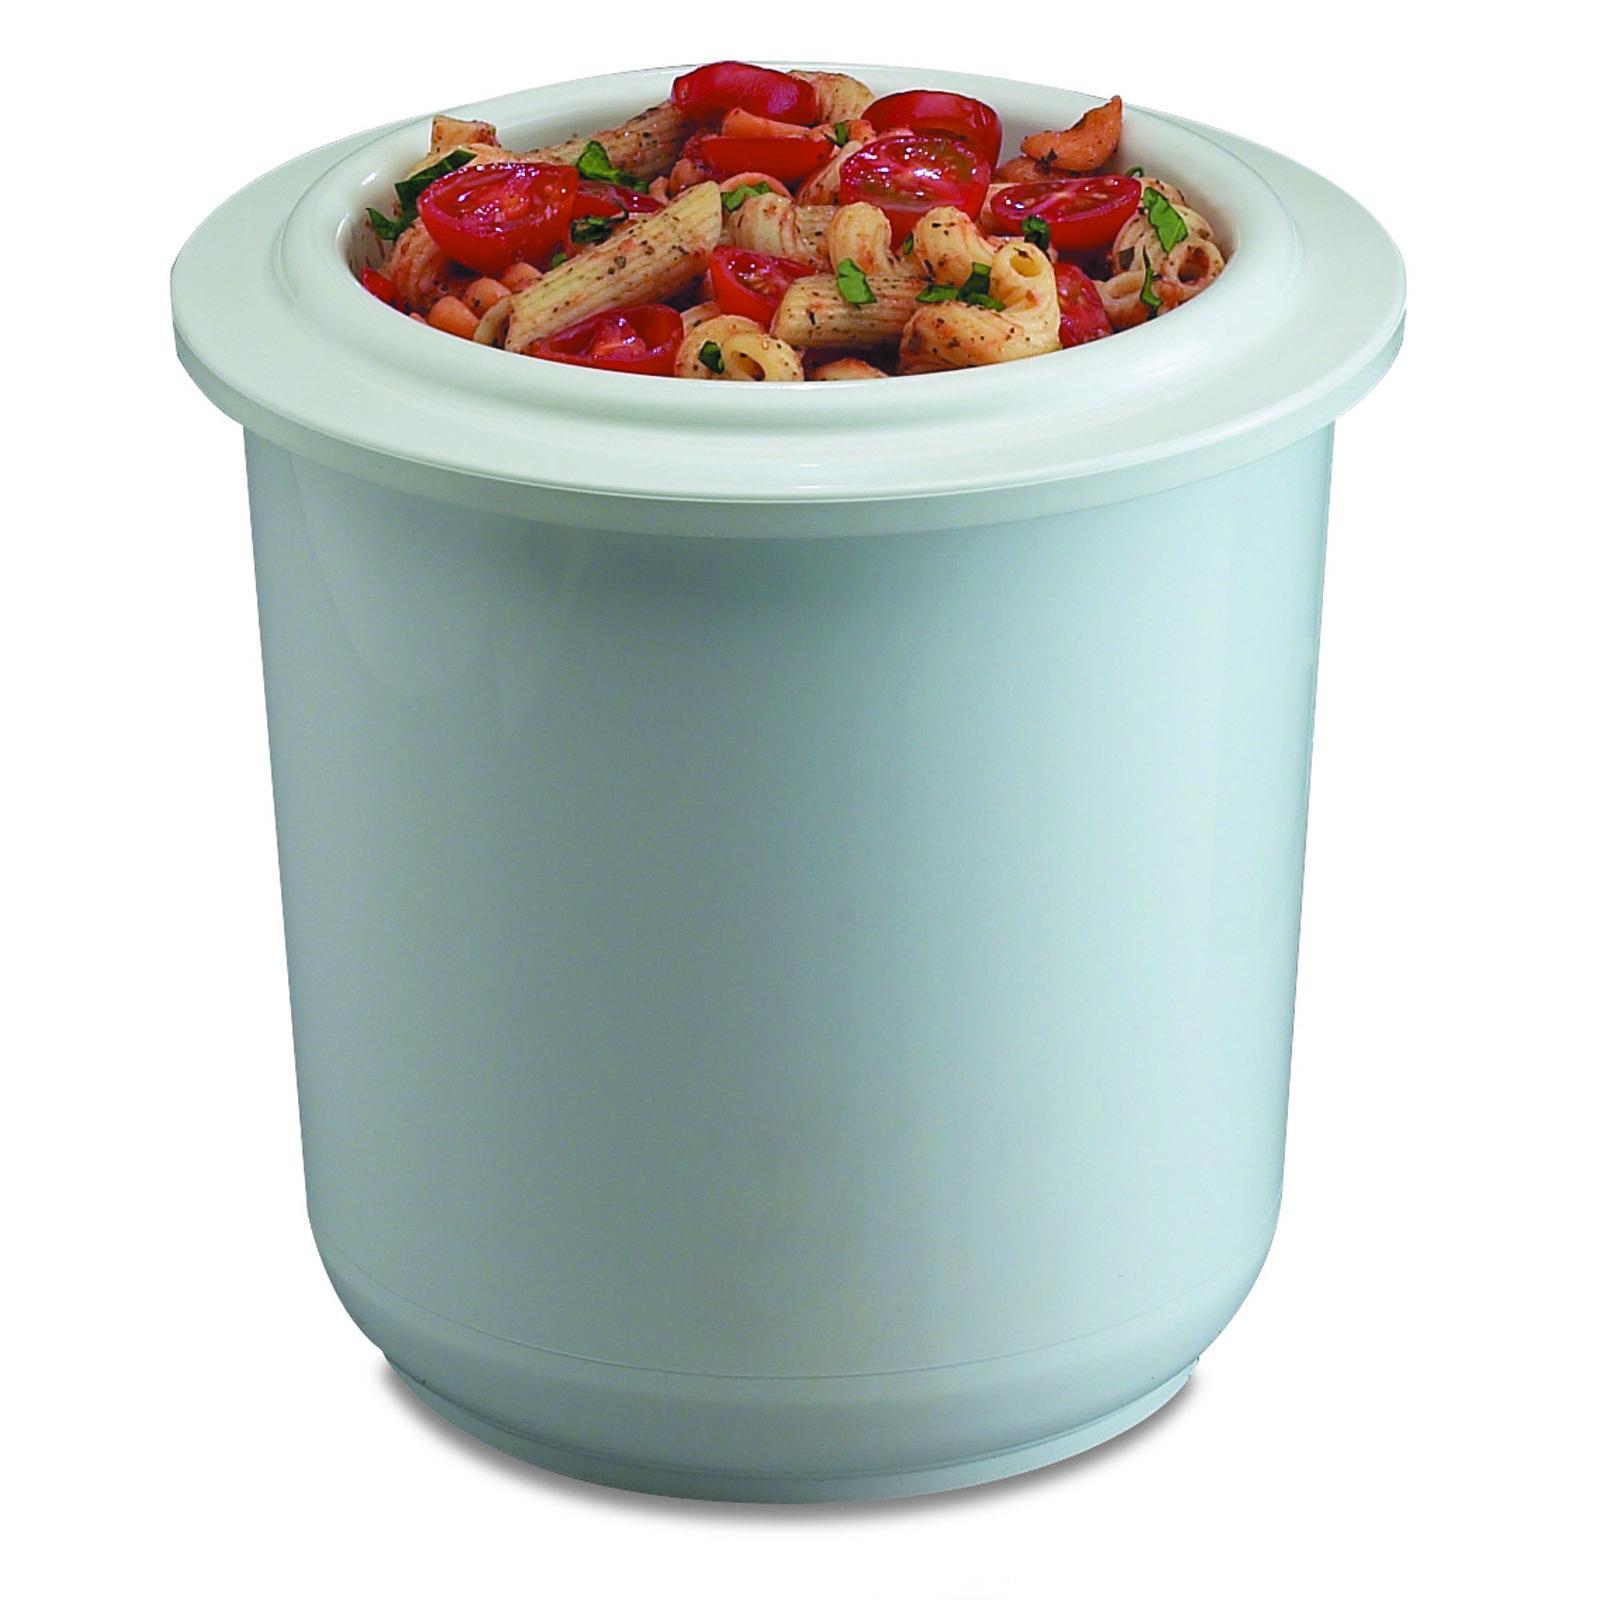 San Jamar CI7015WH salad crock, plastic